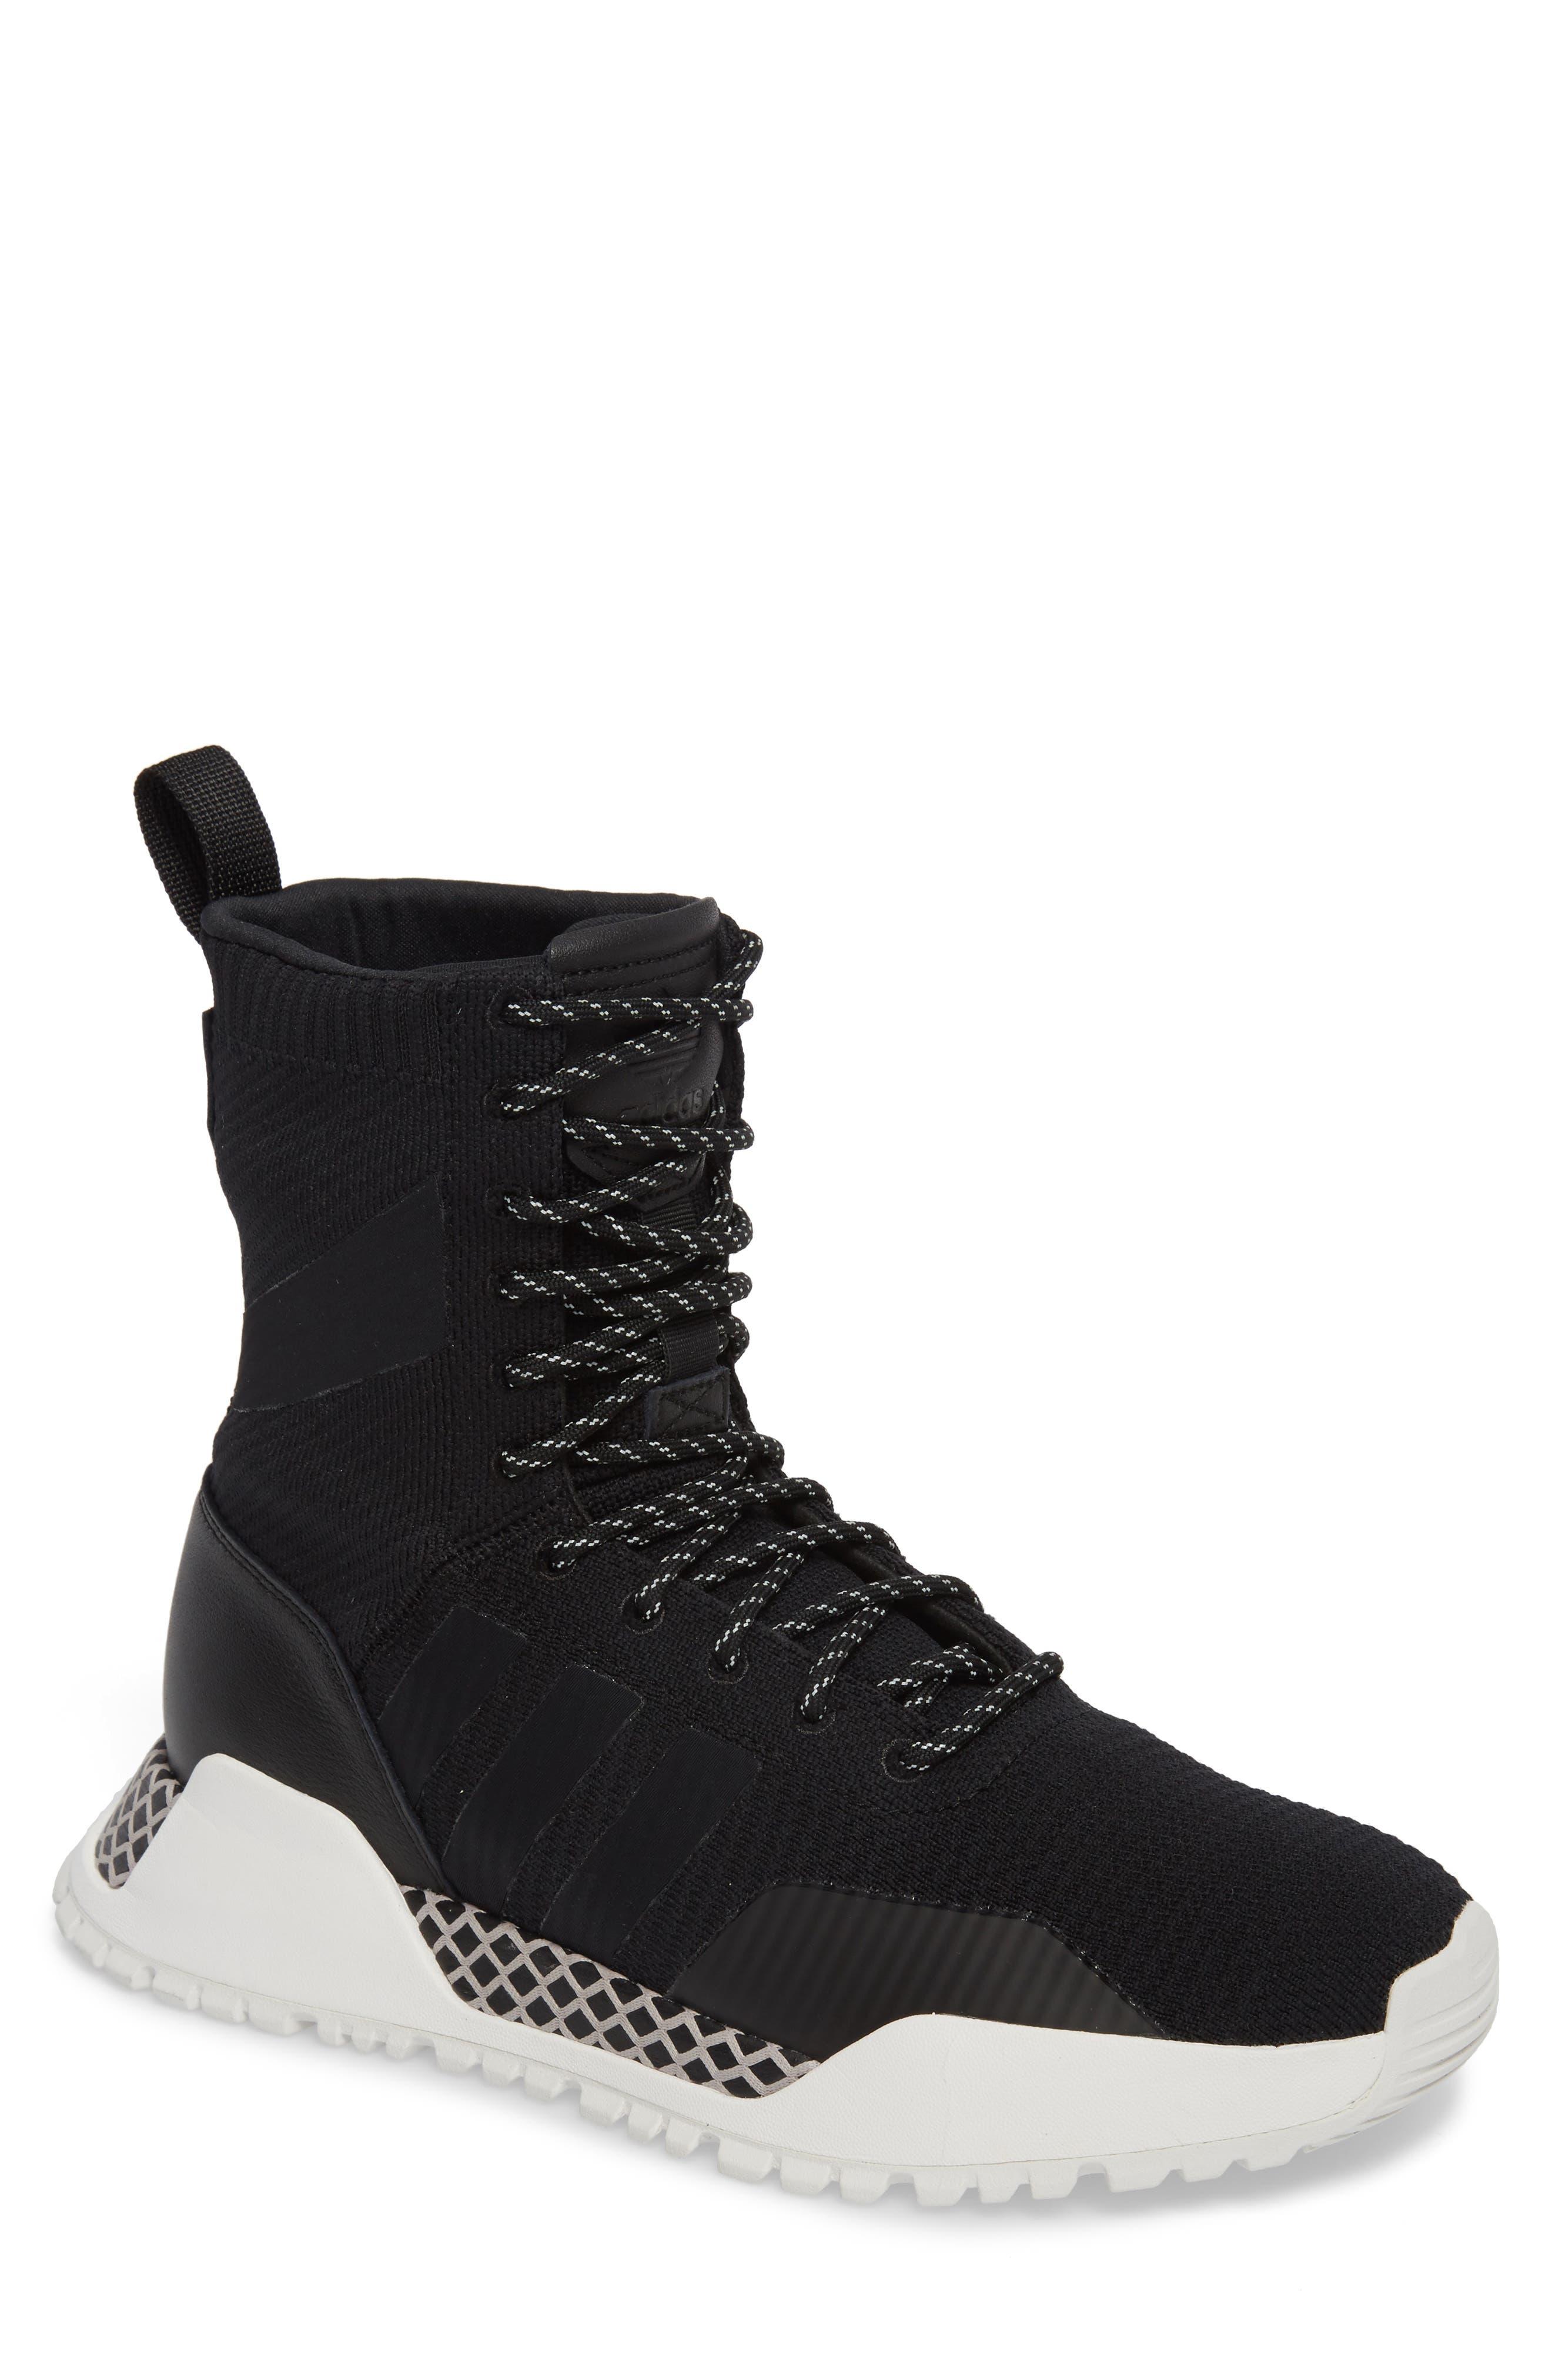 52c2dff61 adidas ultra boost 30 core black and white adidas originals mens ...